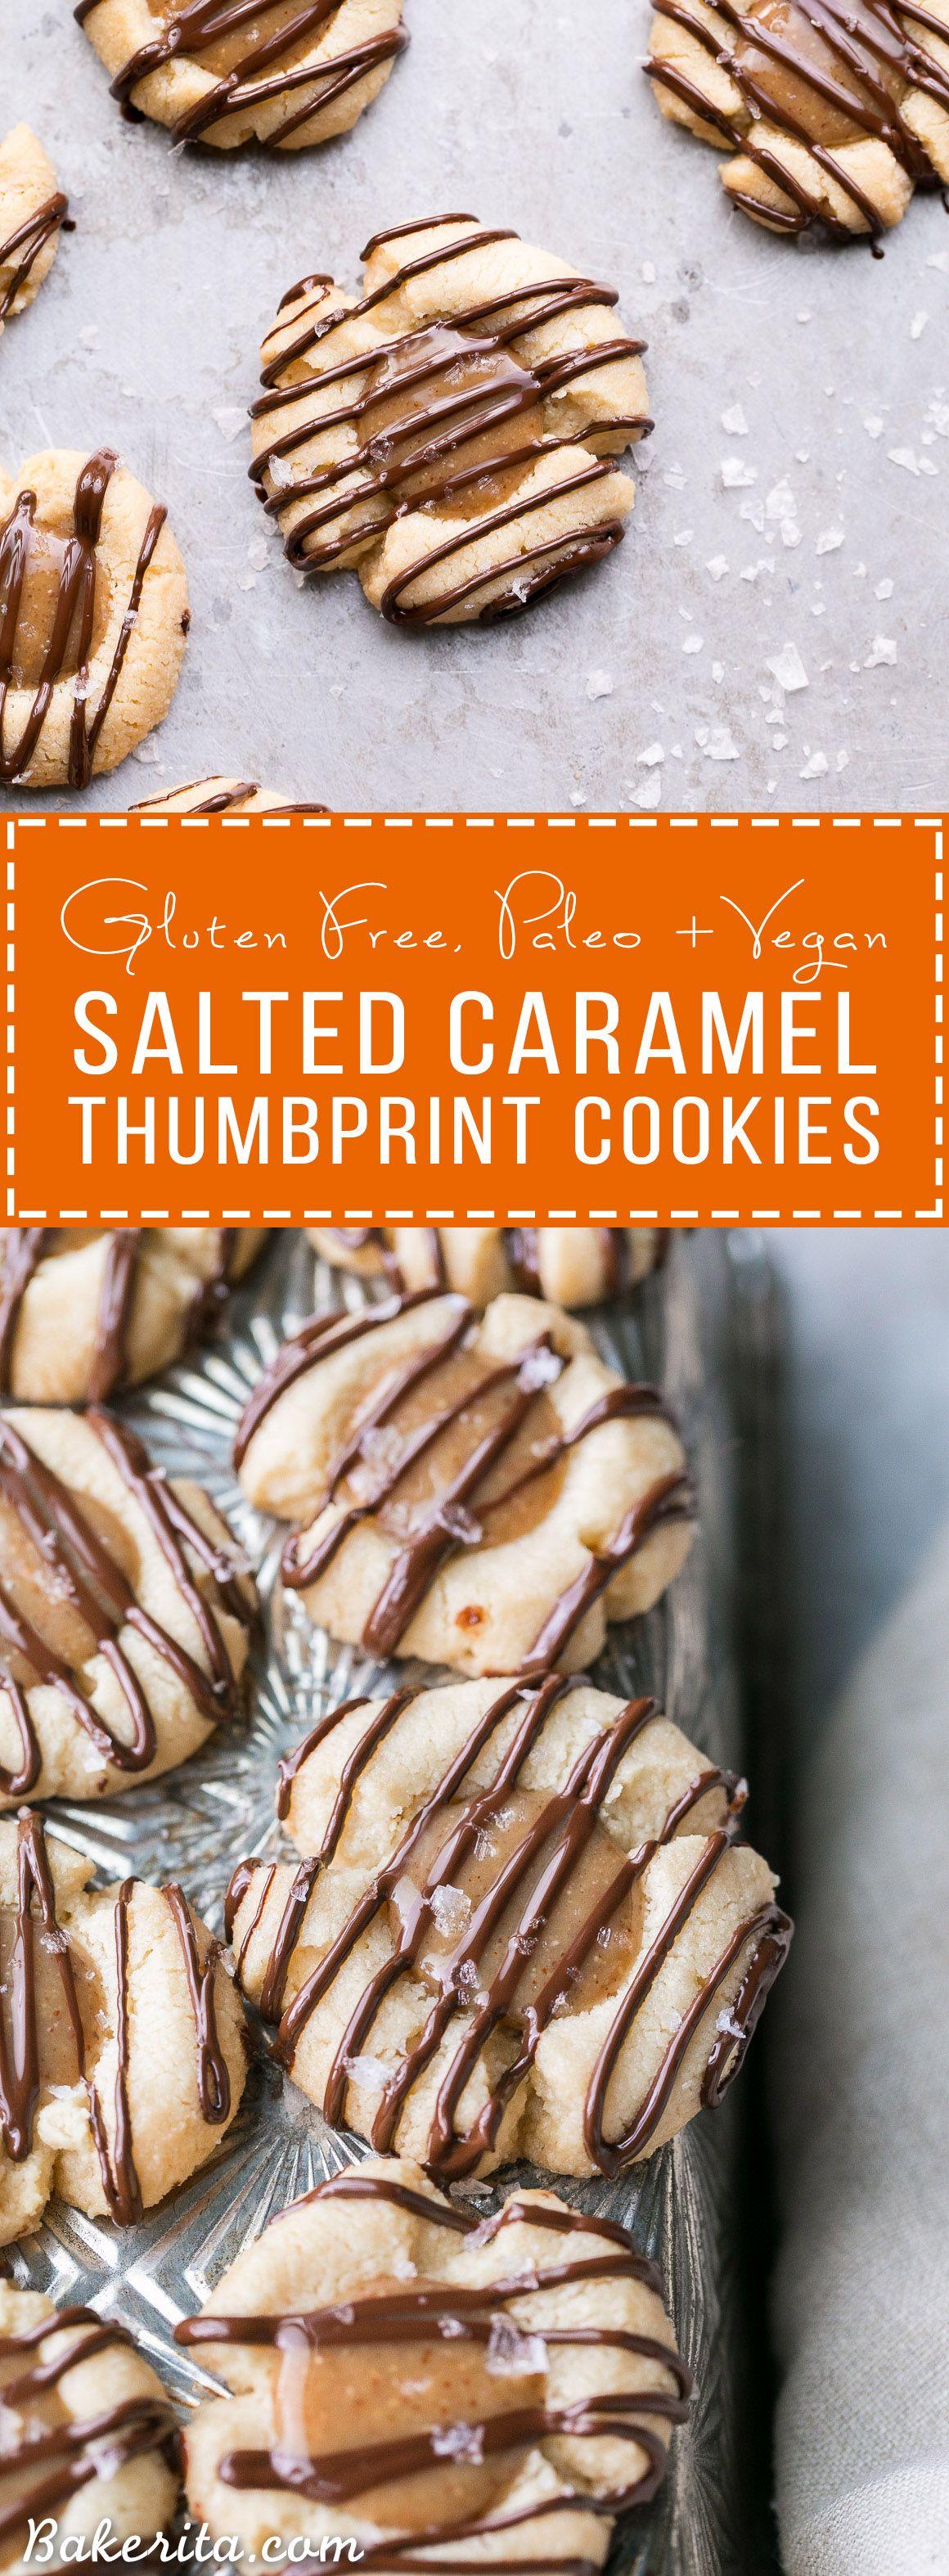 Salted Caramel Thumbprint Cookies (Gluten Free, Paleo + Vegan) • Bakerita